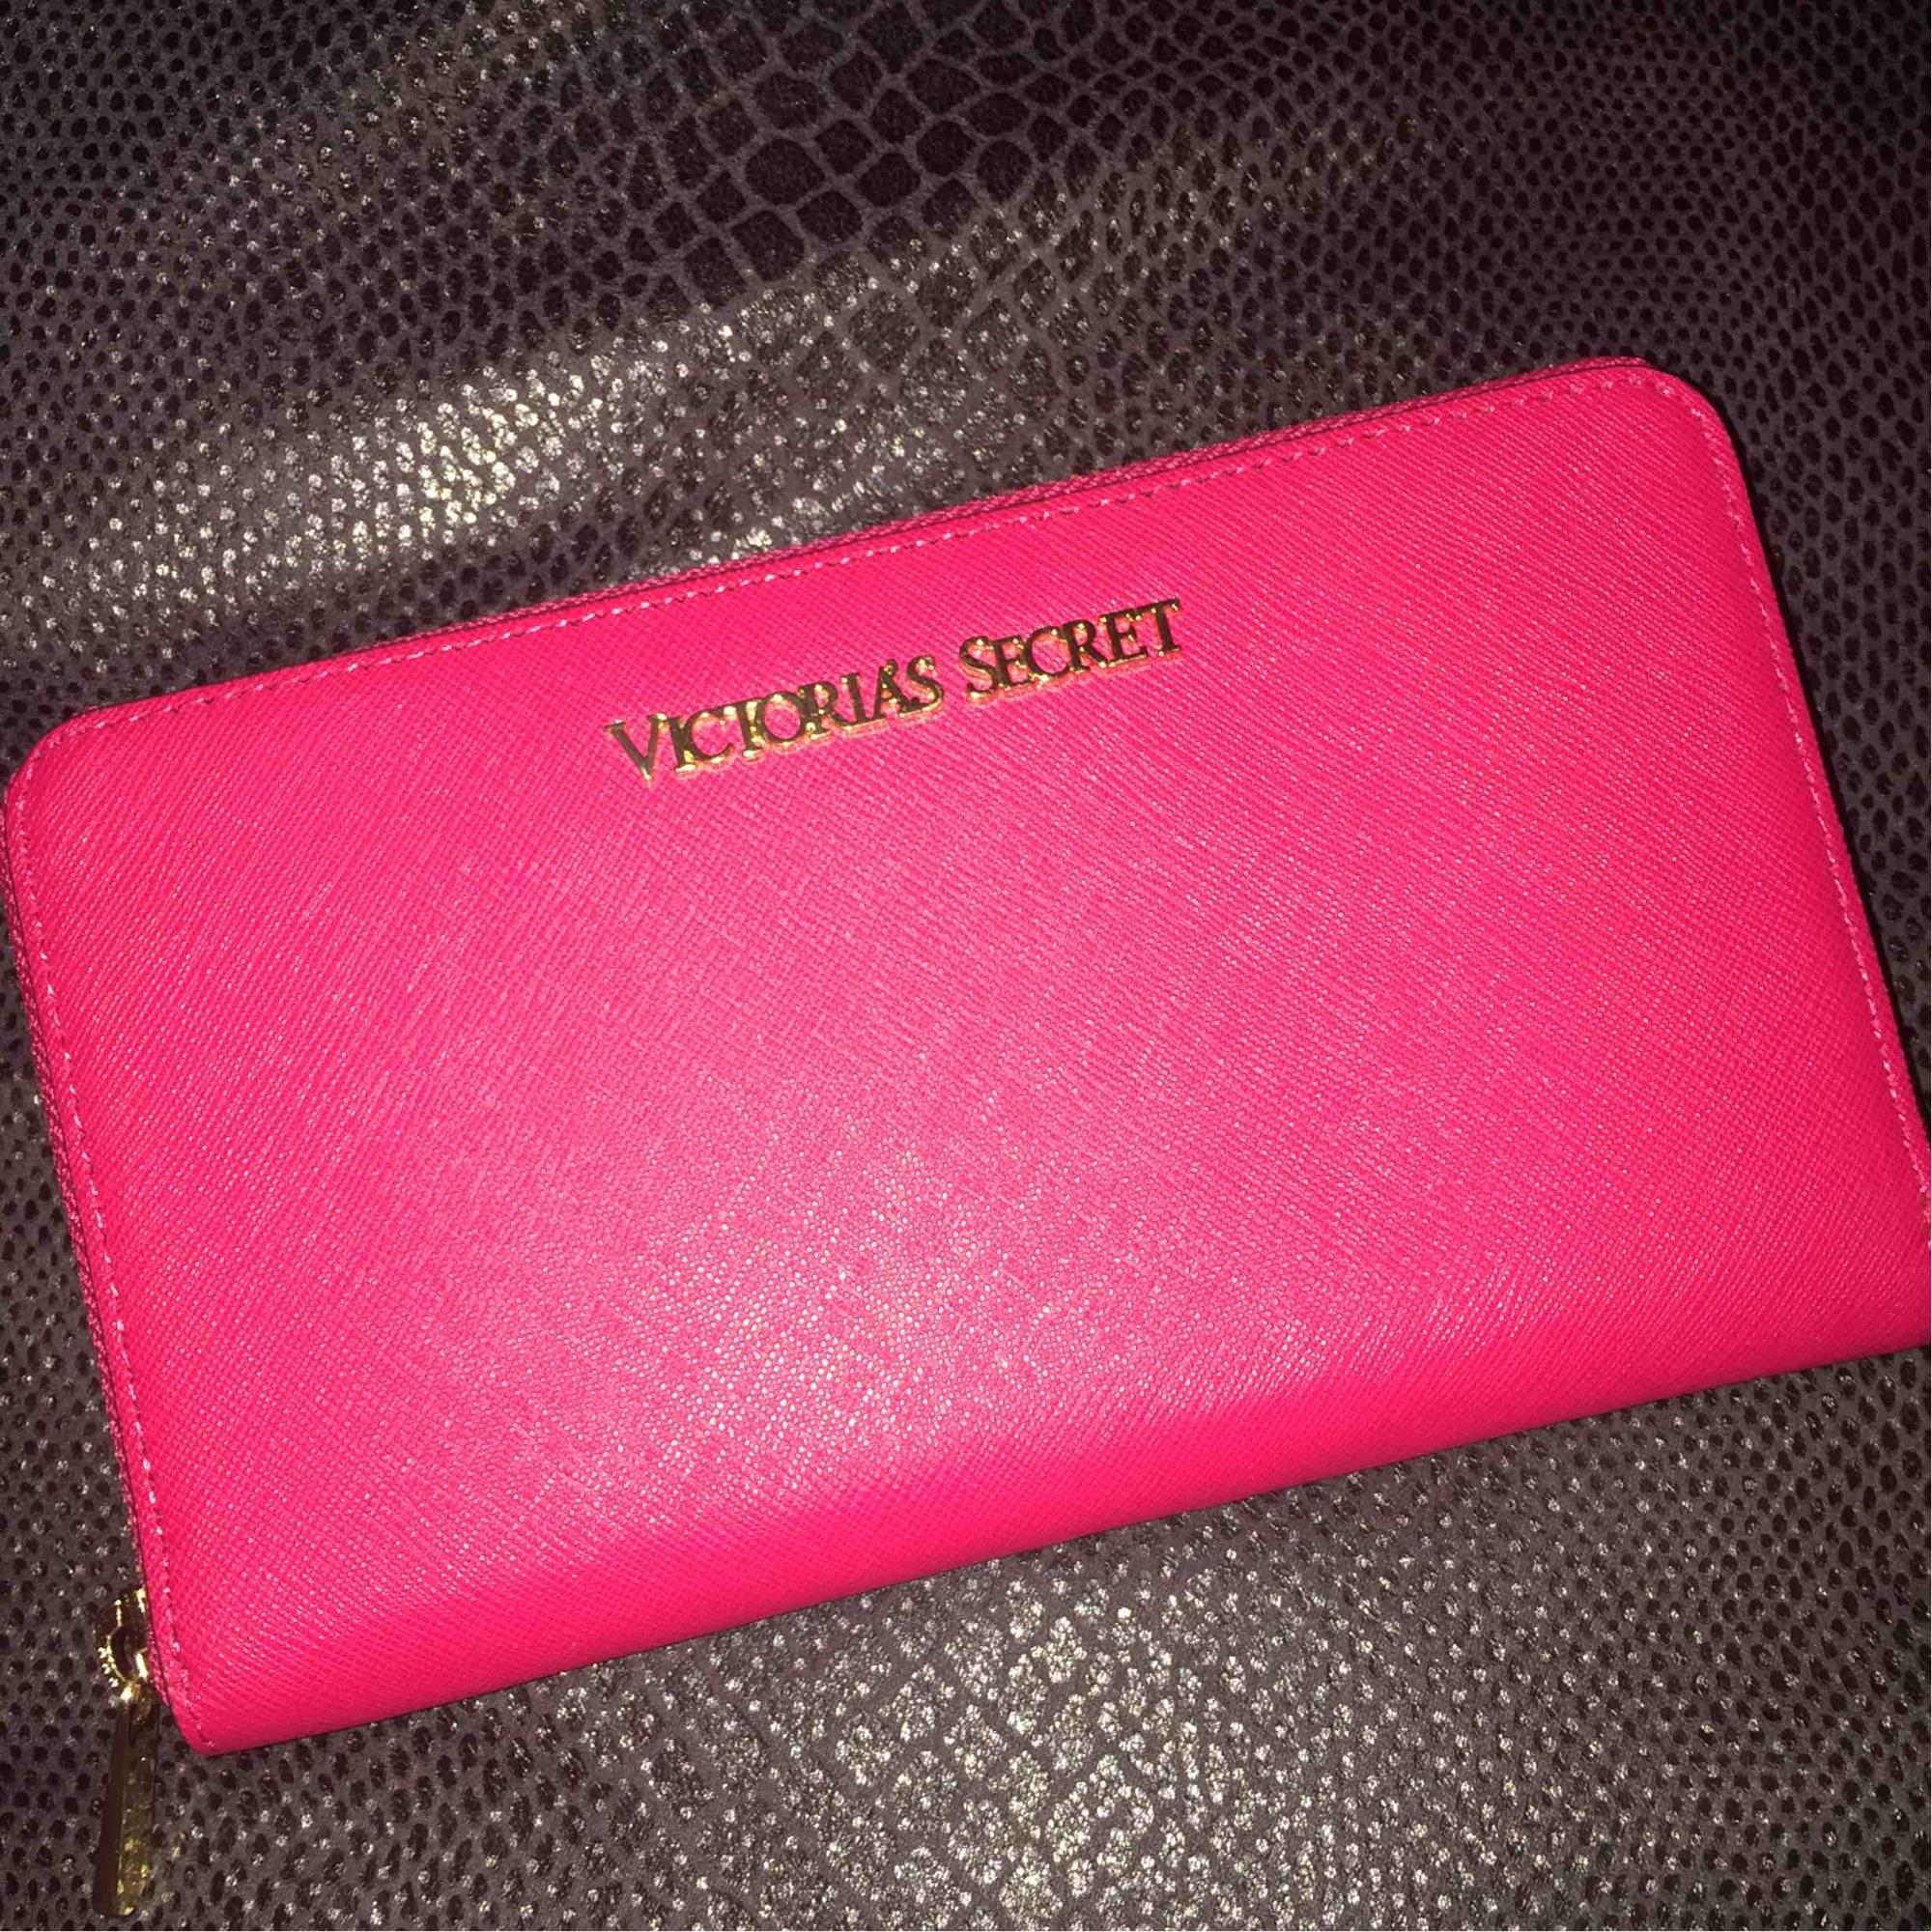 fd1c86b316e Portefeuille VICTORIA'S SECRET rose vendu par Sabrina 826 - 5161249